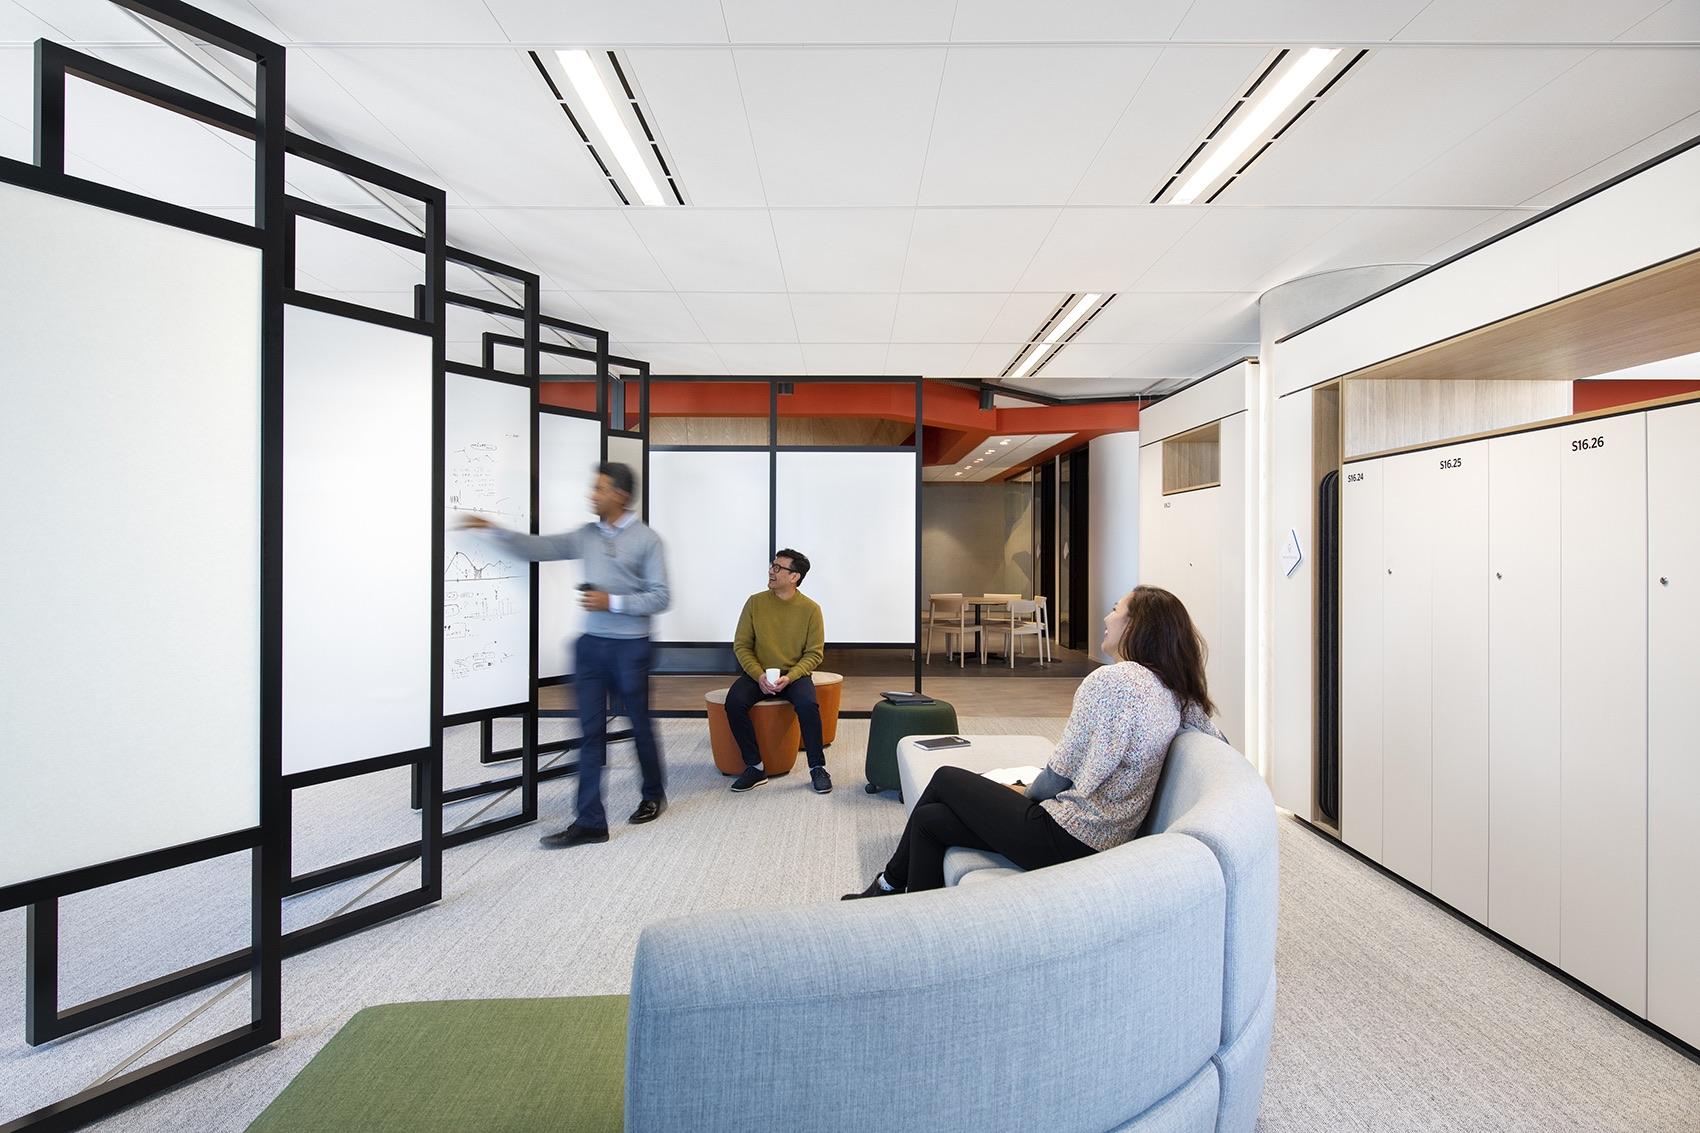 qbe-insurance-office-4